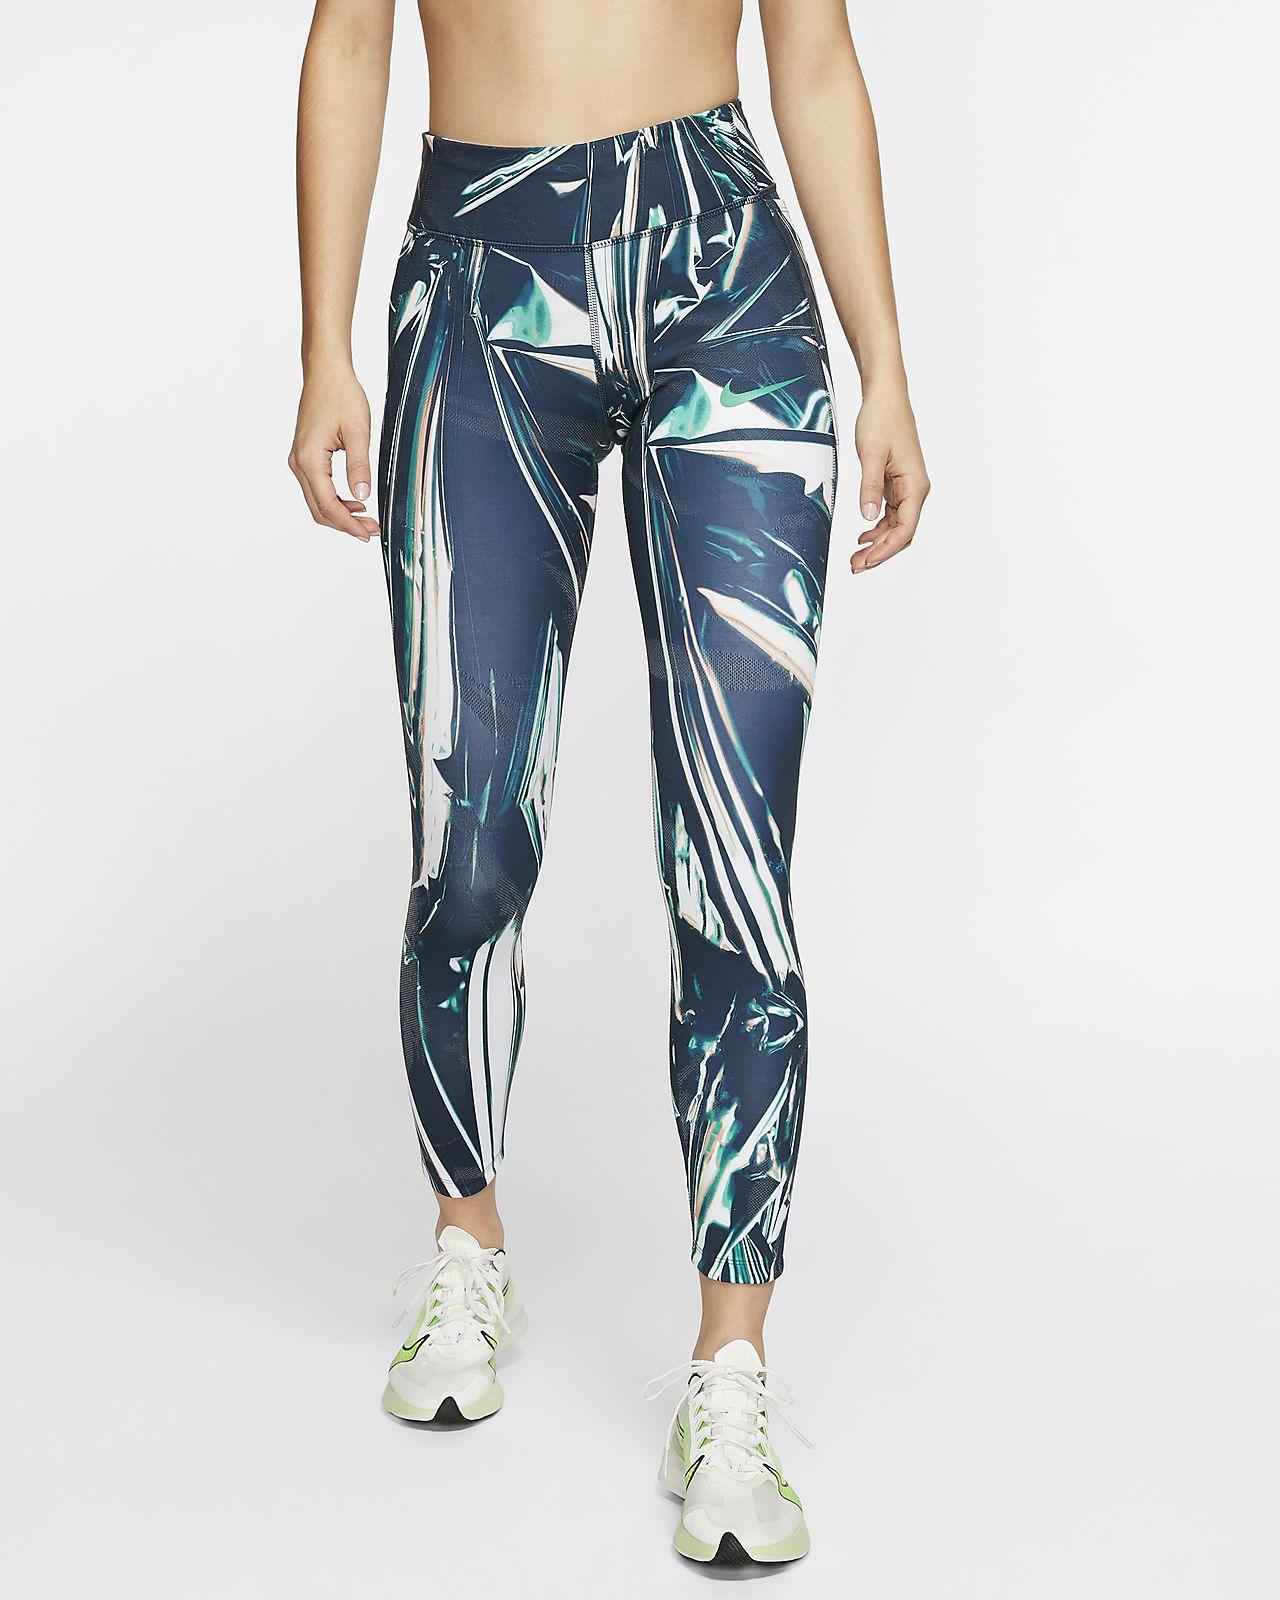 Nike Epic Lux Women's Running Leggings